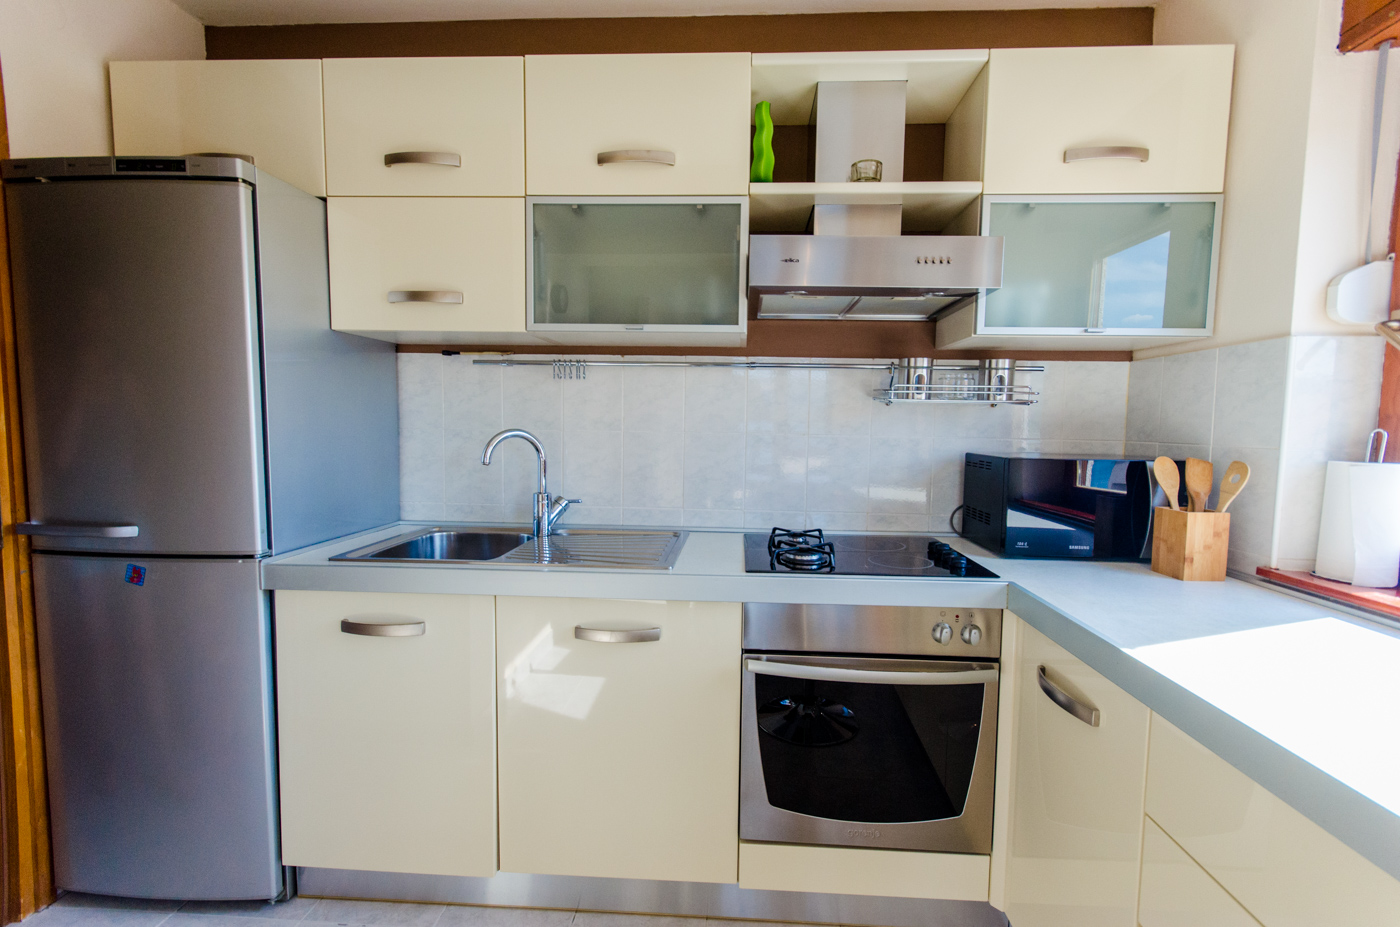 Apartments Mart, Mastrinka - Srednja Dalmacija - MyHolidaysInCroatia.com